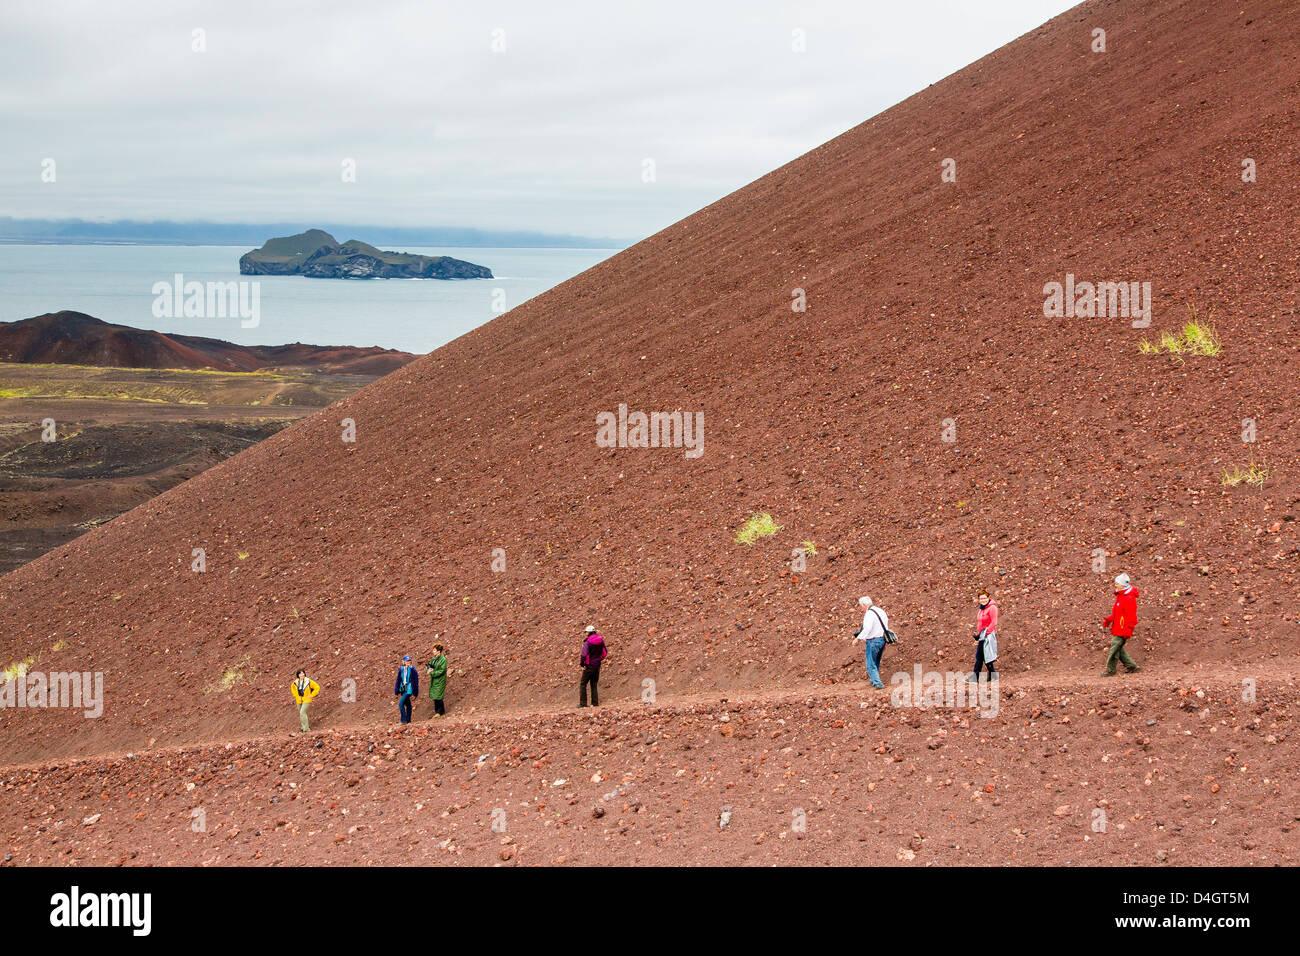 Hiking on recent lava flow on Heimaey Island, Iceland, Polar Regions - Stock Image